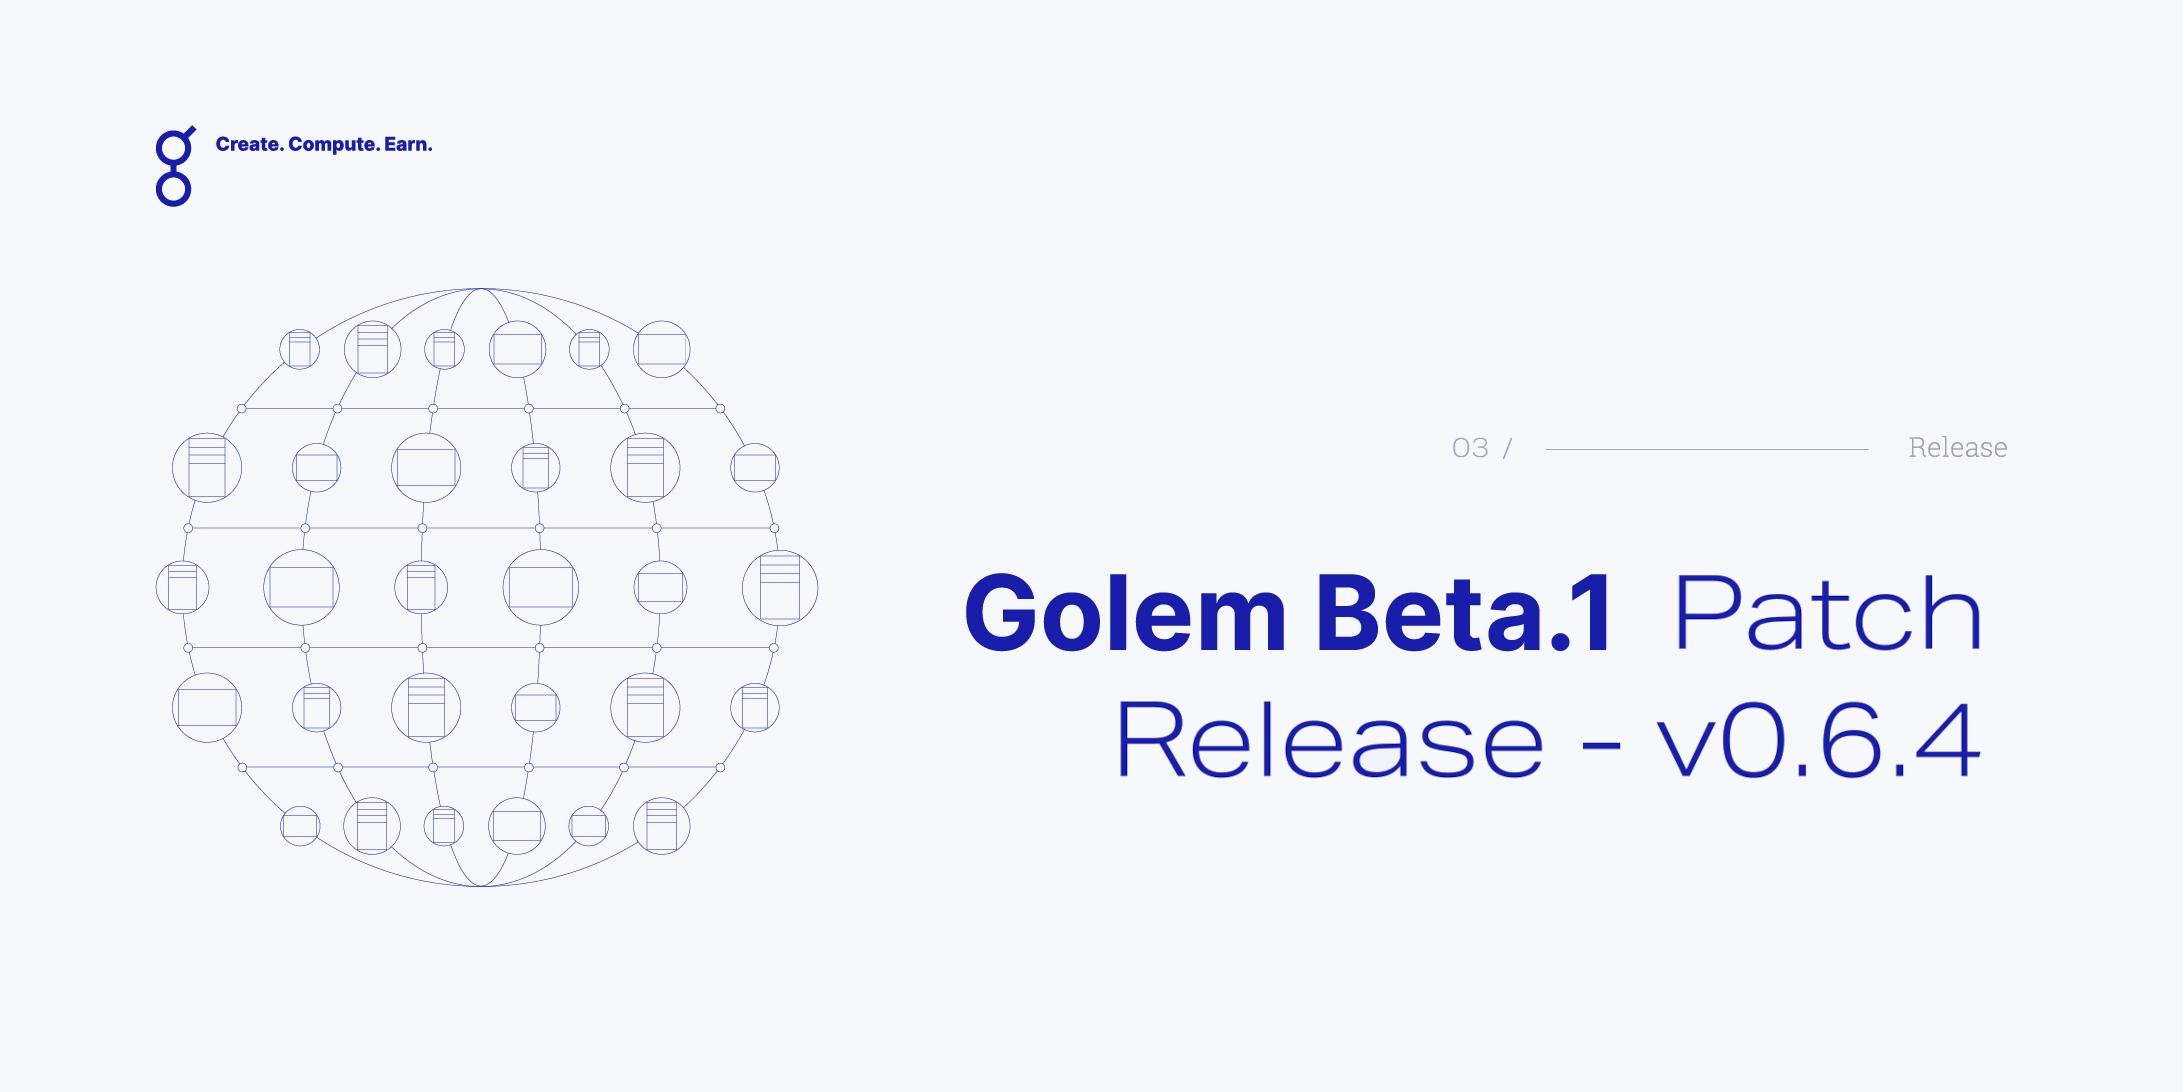 Golem Beta 1 Patch Release - v0.6.4